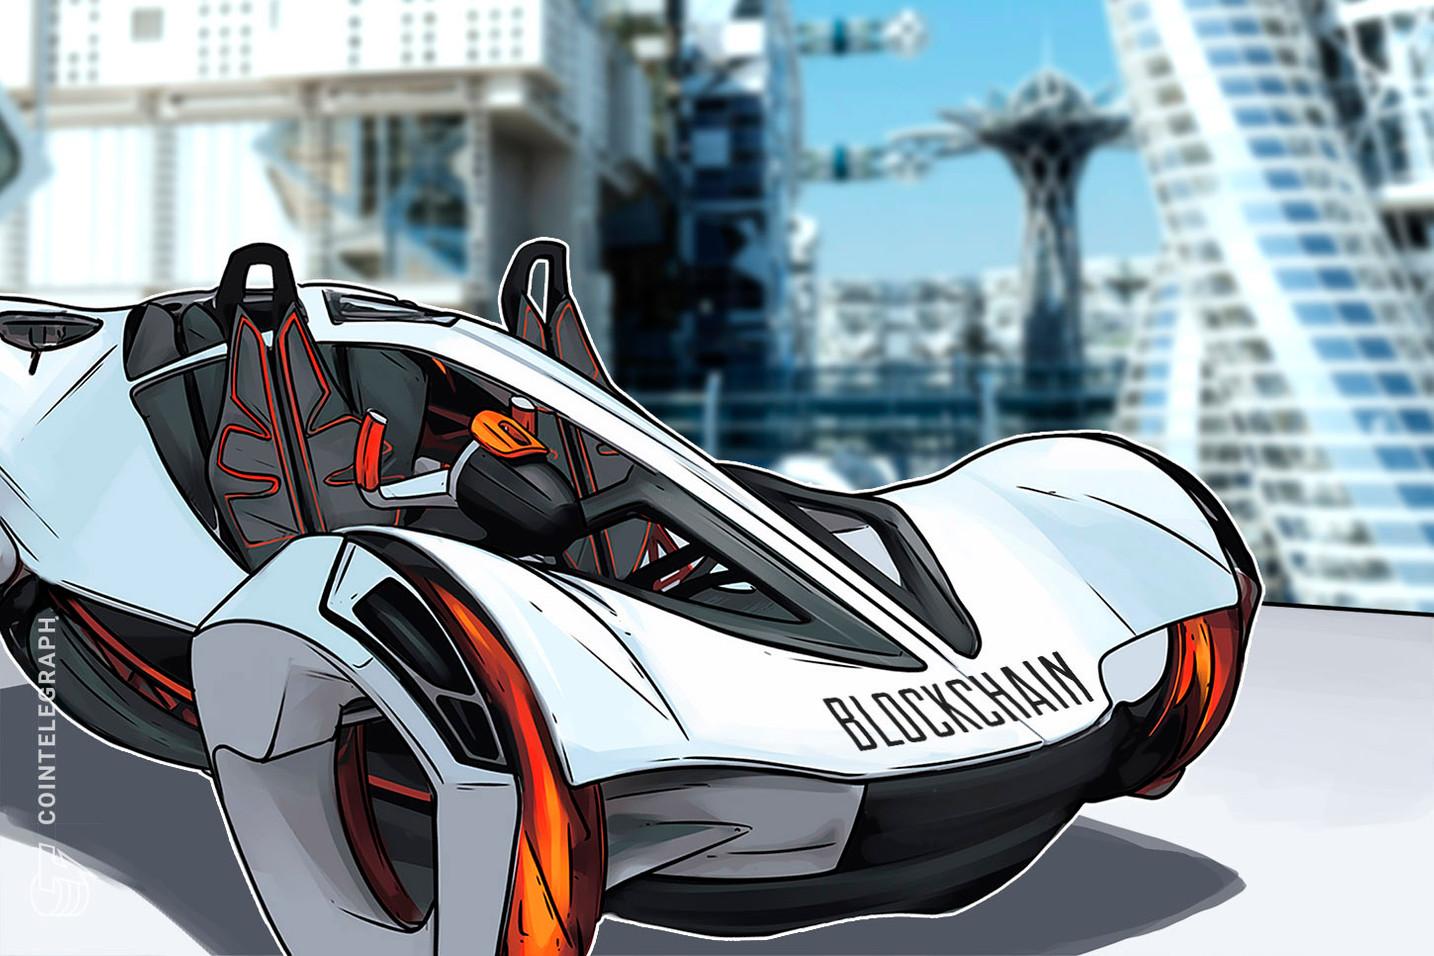 Volkswagen se junta a plataforma Blockchain com apoio da IBM para cadeias de suprimento de cobalto